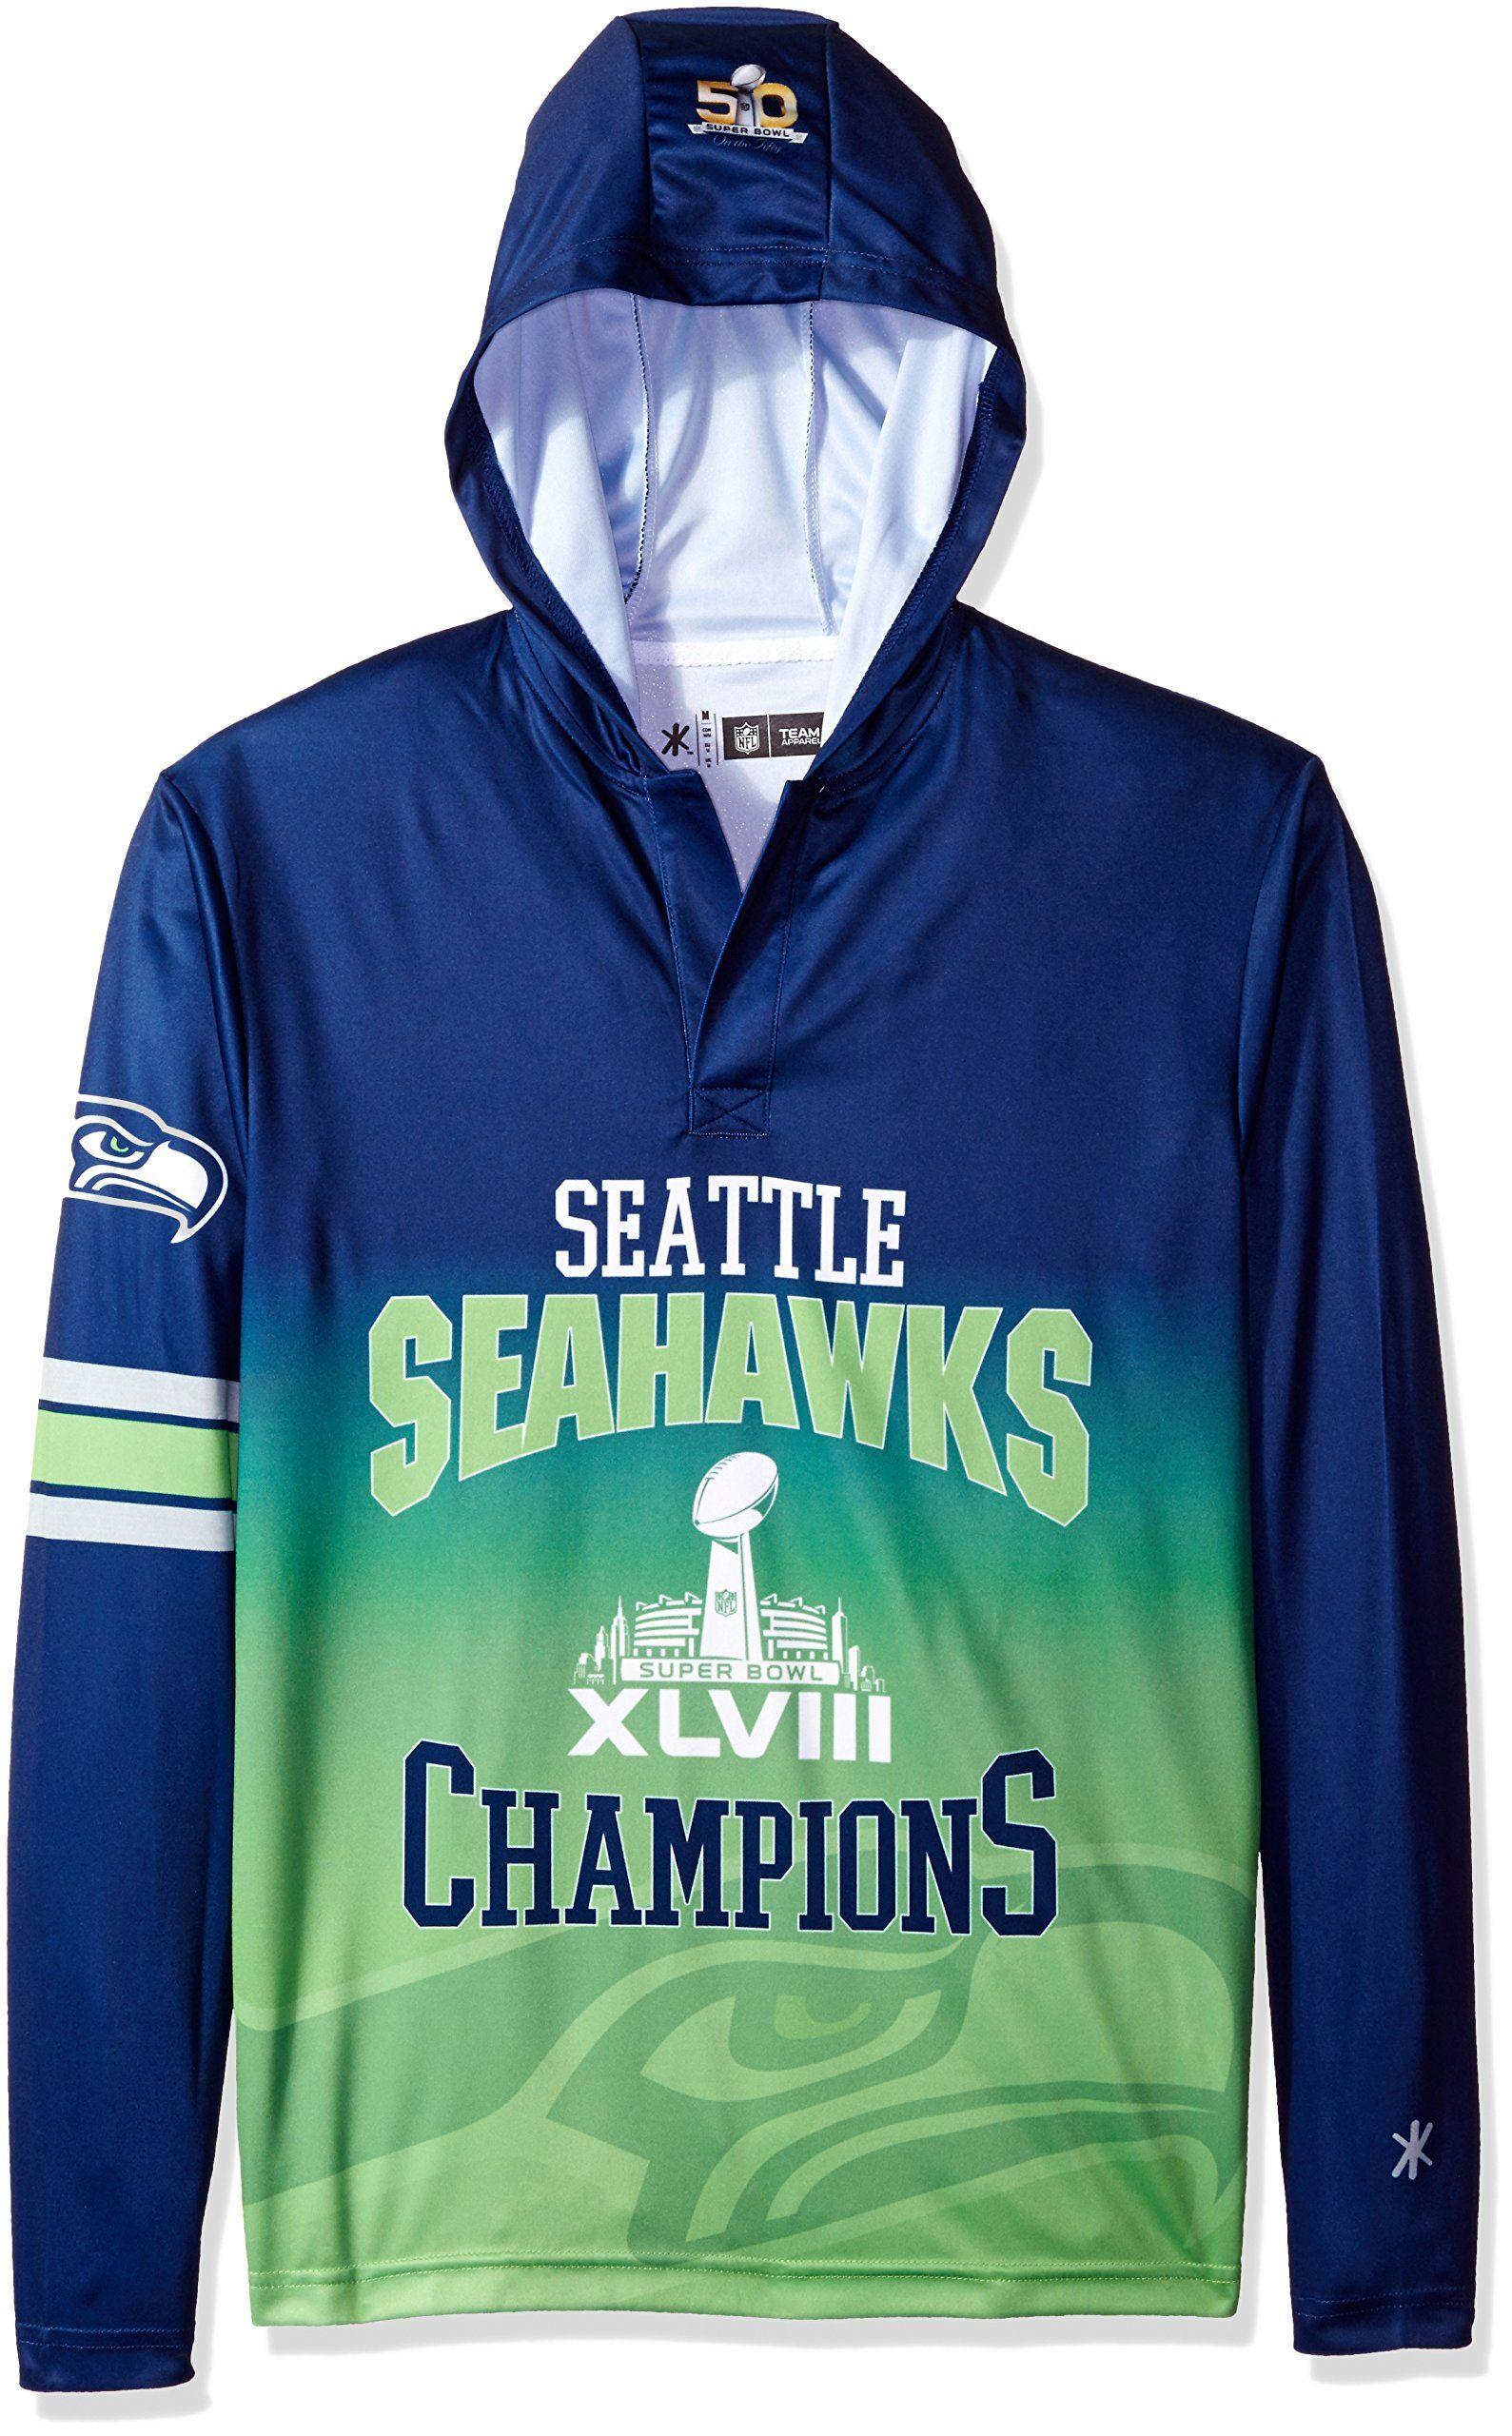 9c158f10 Seattle Seahawks Super Bowl Champs Sweatshirt - DREAMWORKS